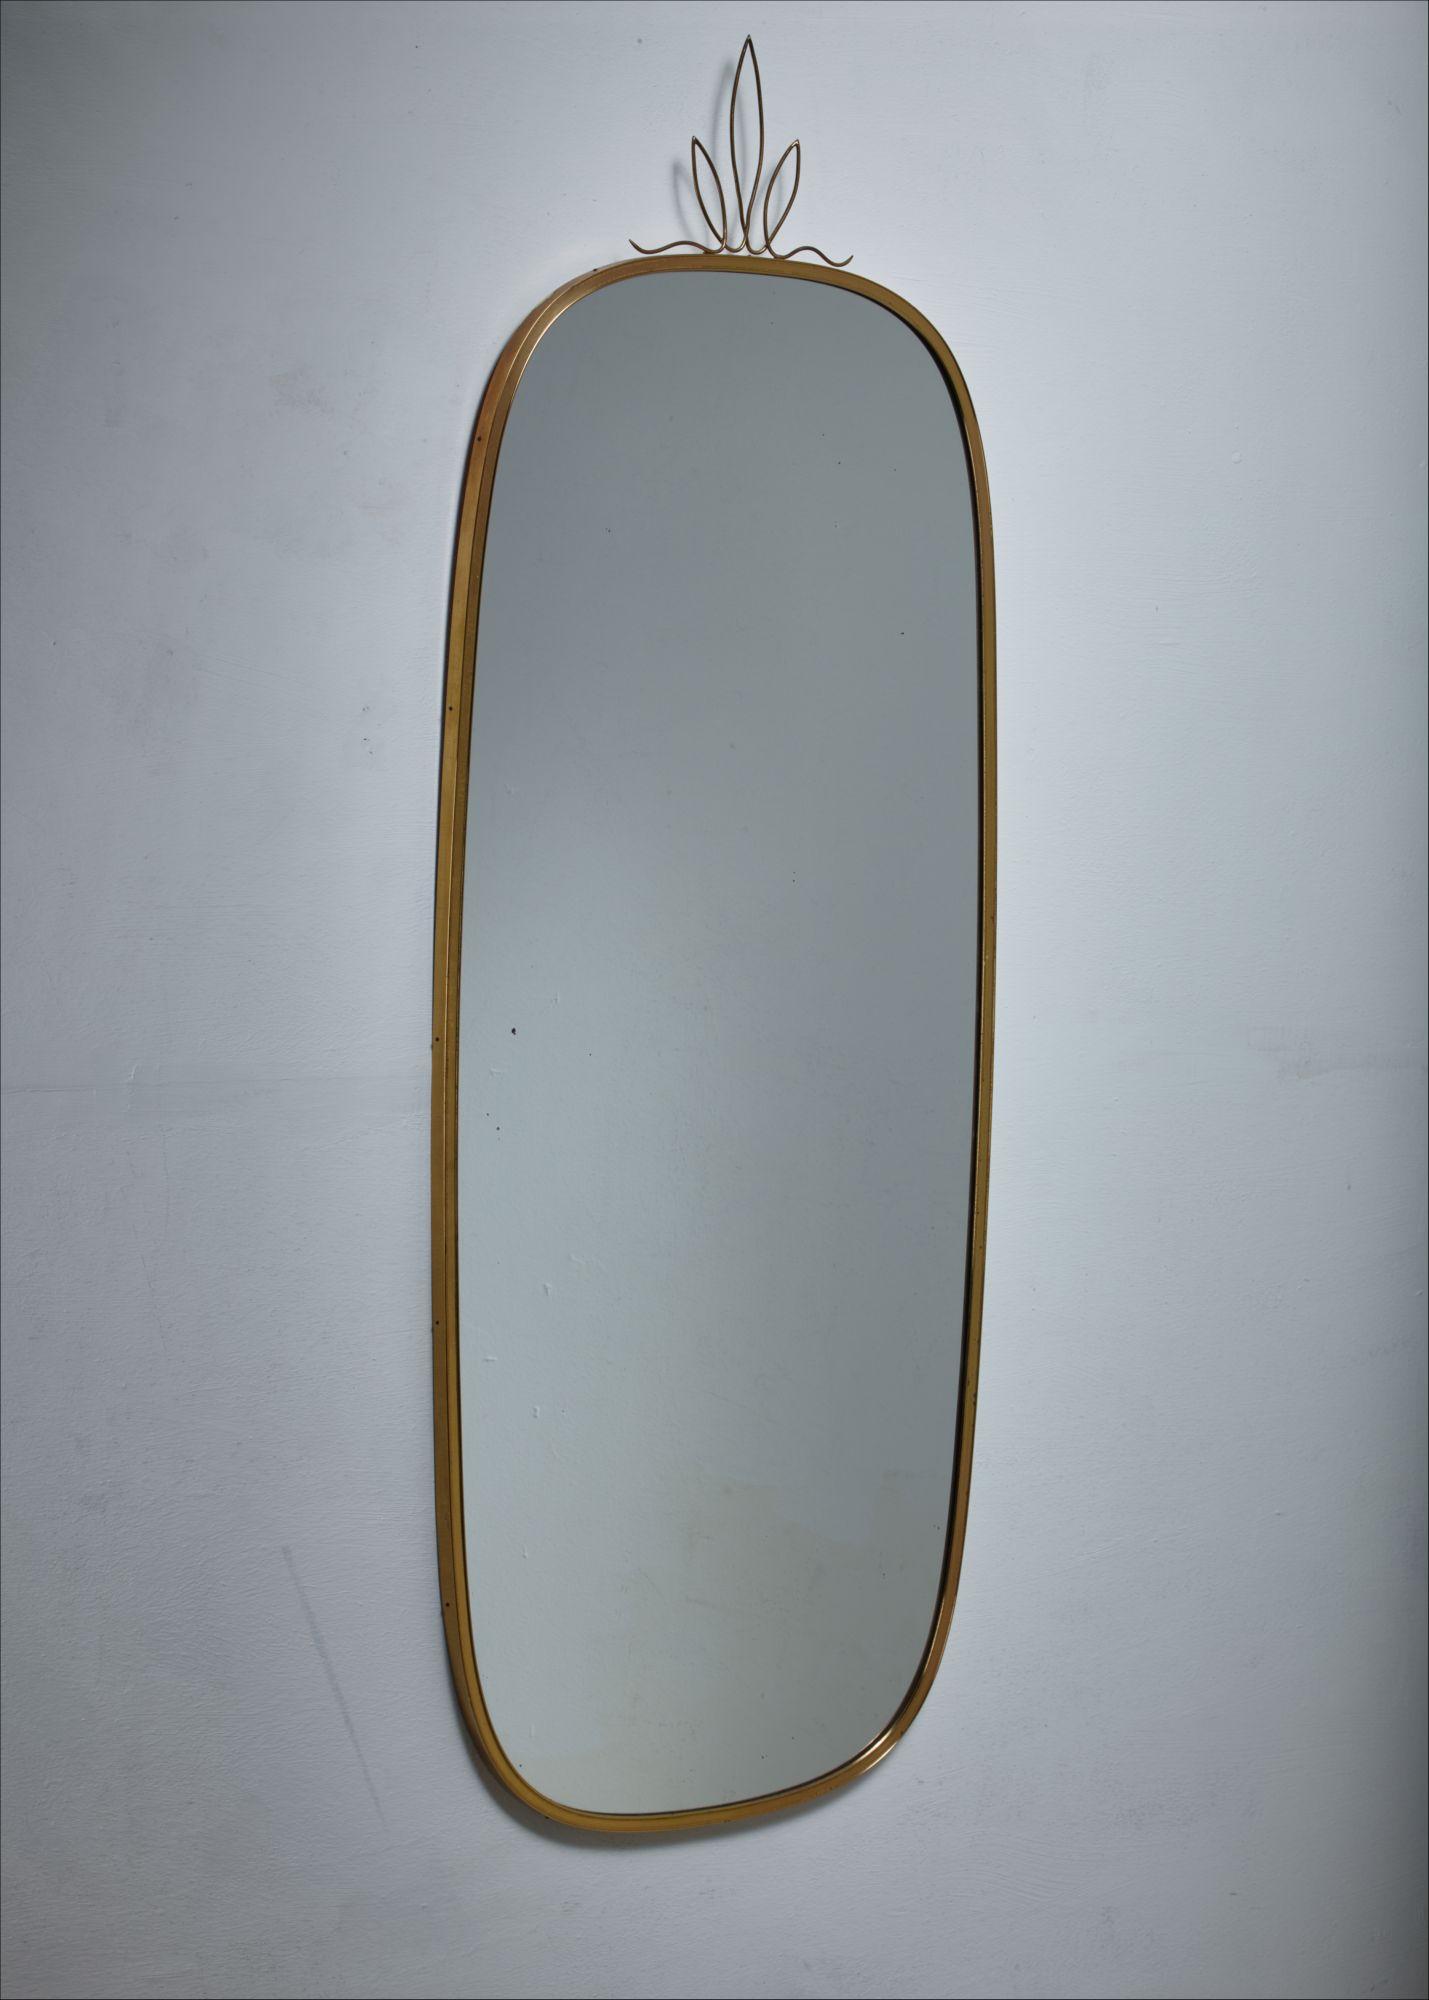 Brass Wall Mirror With Crown Decoration Austria 1950s